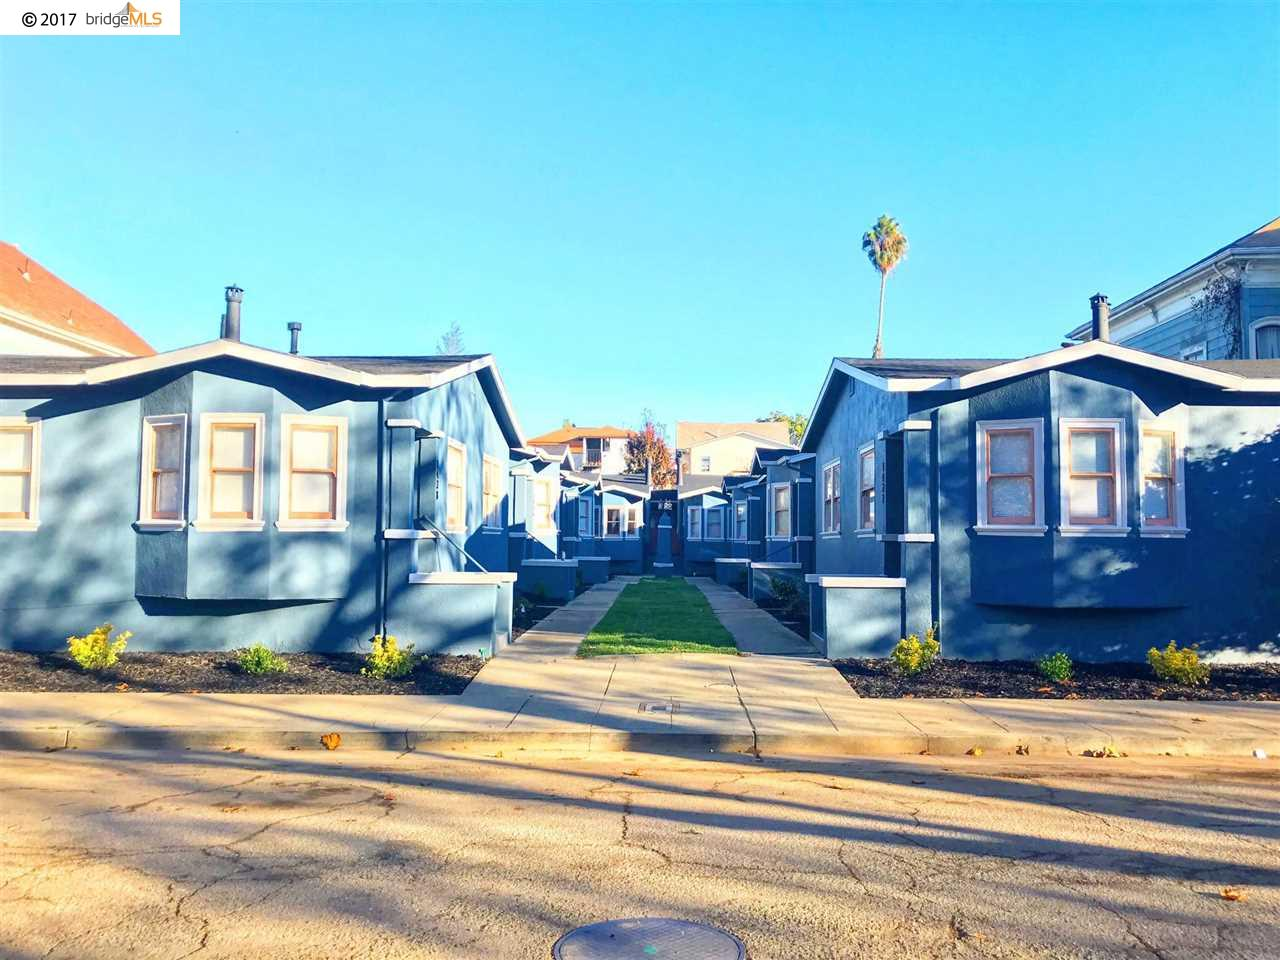 Multi-Family Home for Sale at 1422 Chestnut Street 1422 Chestnut Street Oakland, California 94607 United States